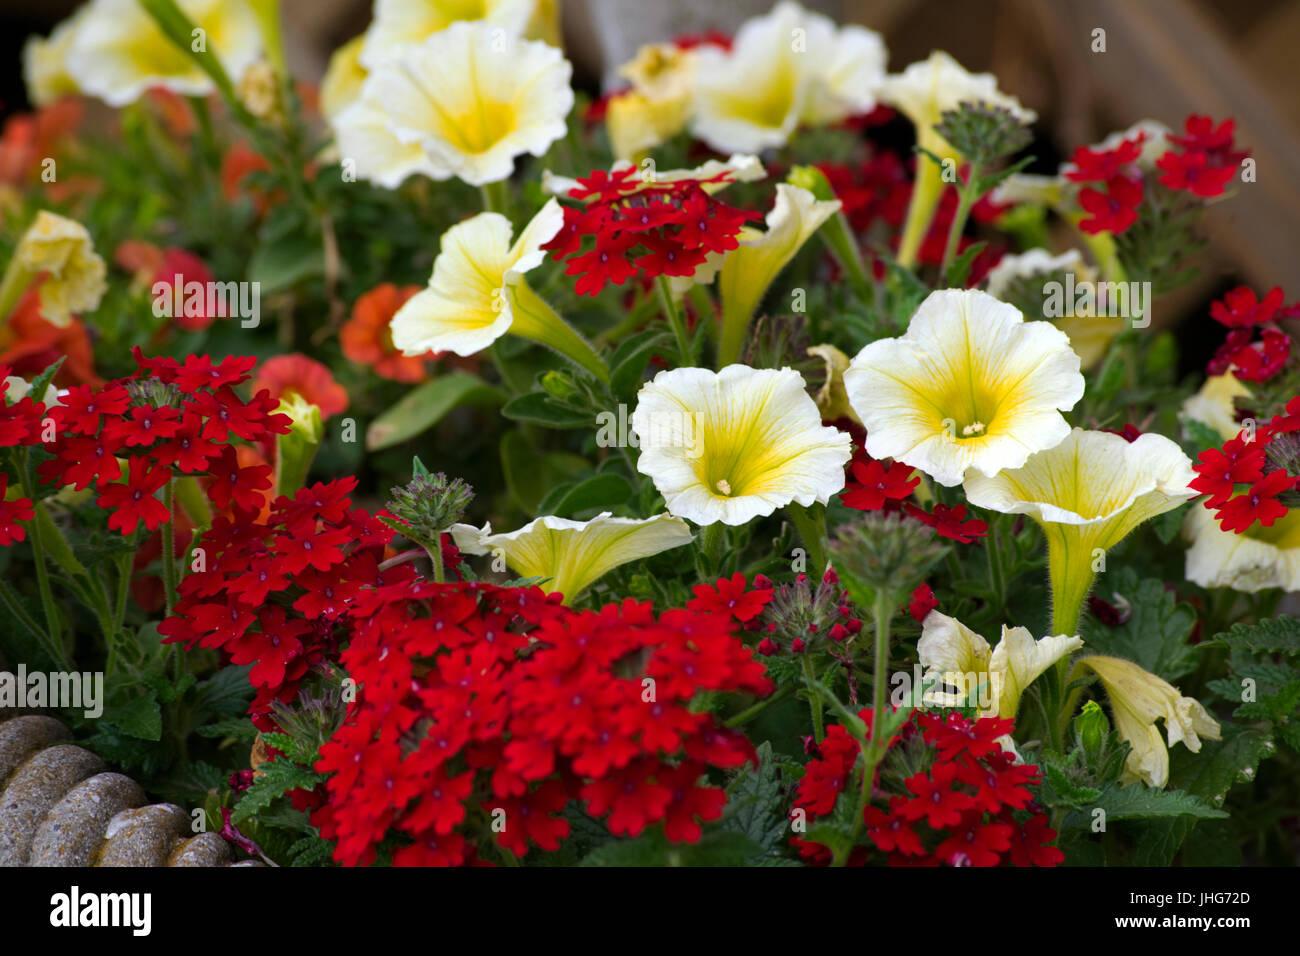 Gardening Pretty Flowers Pot Blooming Stock Photos Gardening